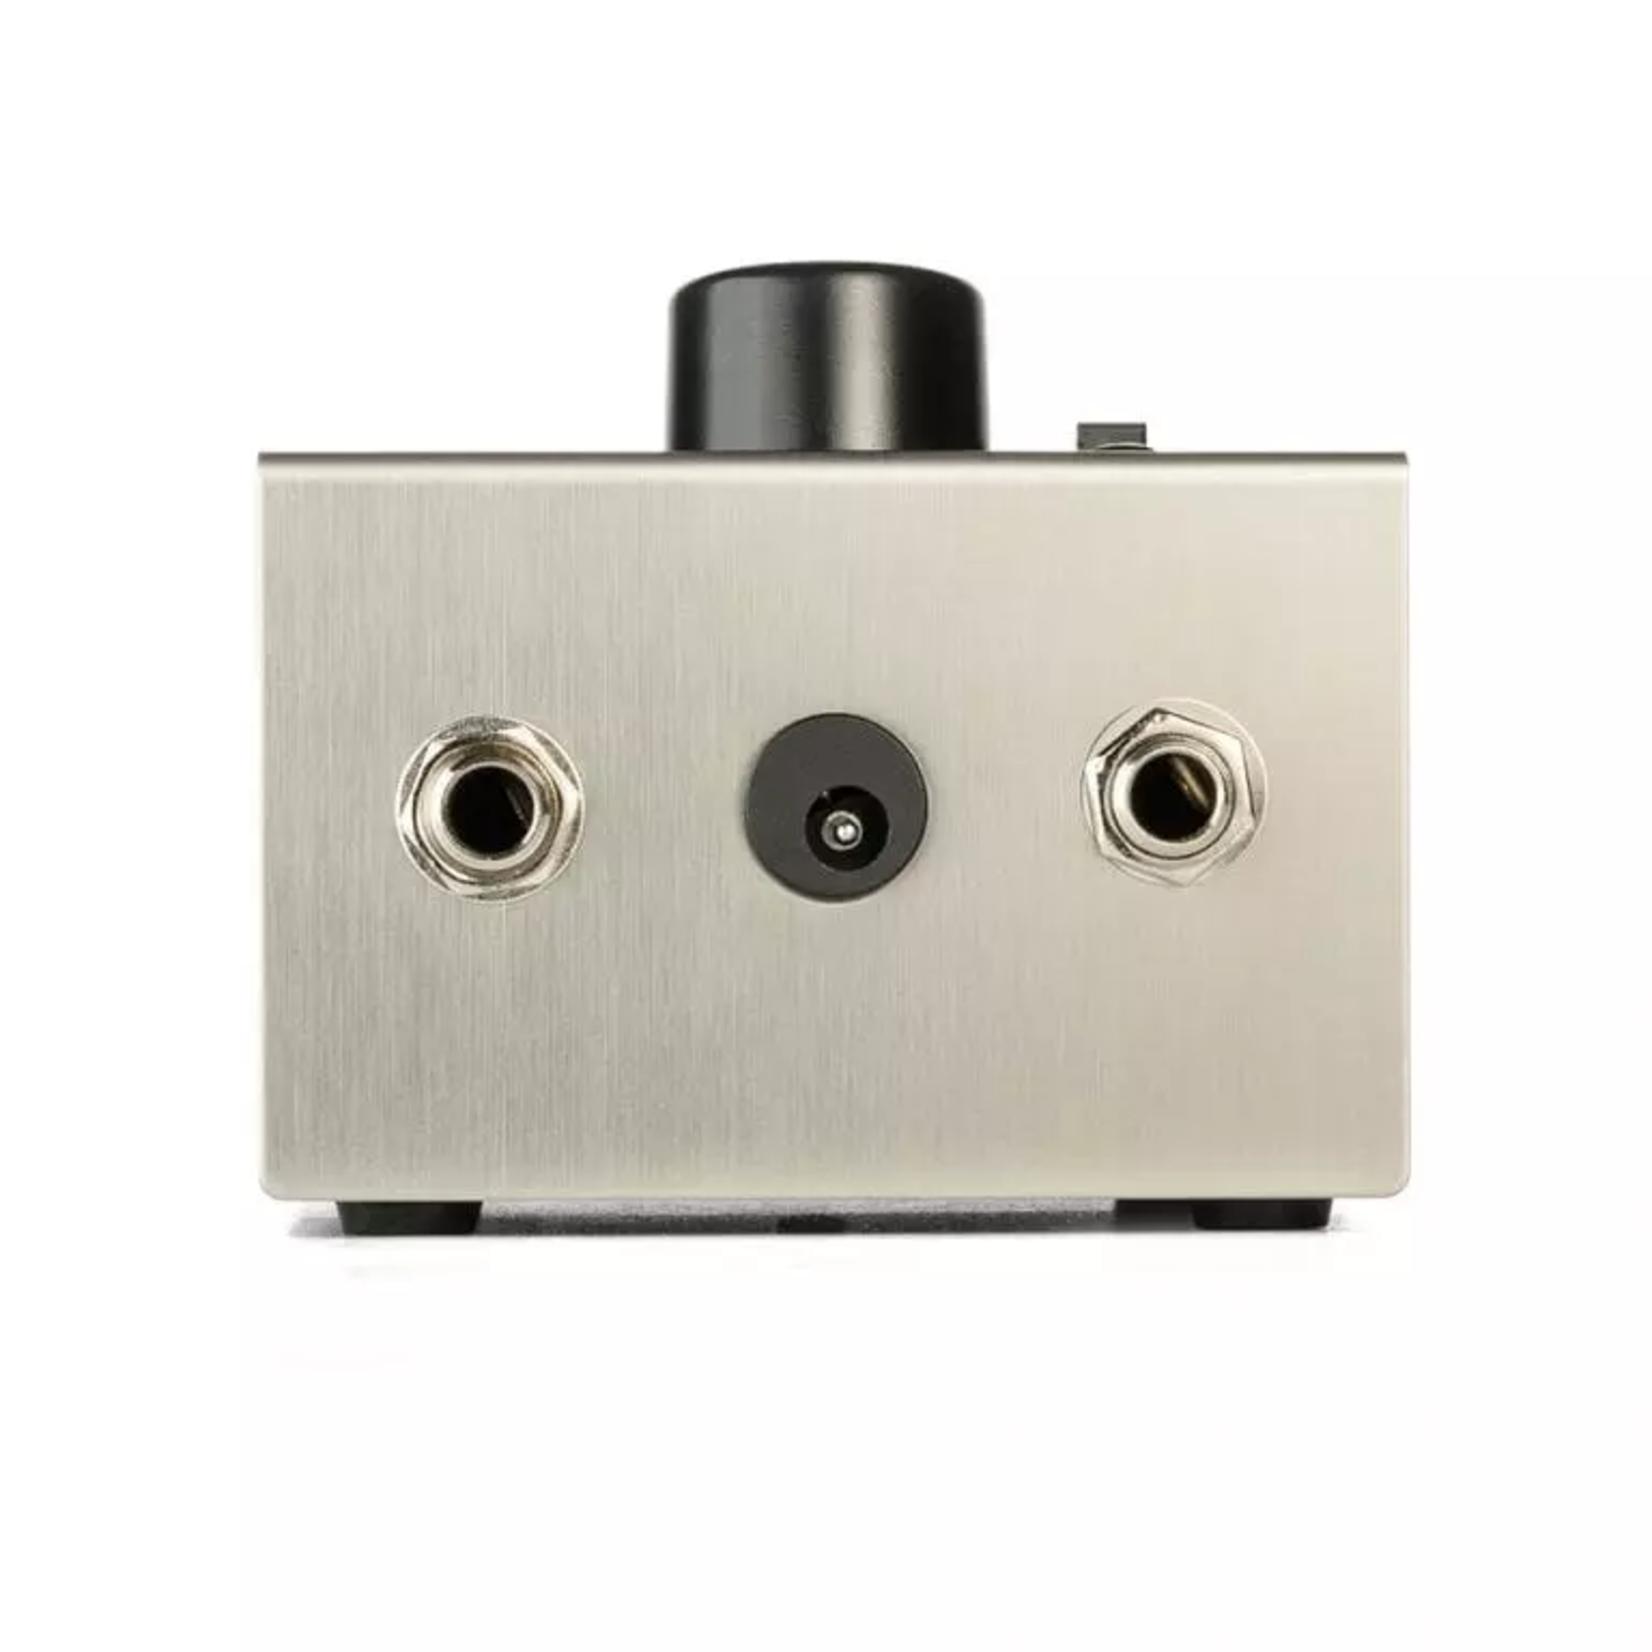 Electro-Harmonix Electro-Harmonix Small Clone Analog Chorus EH 4600